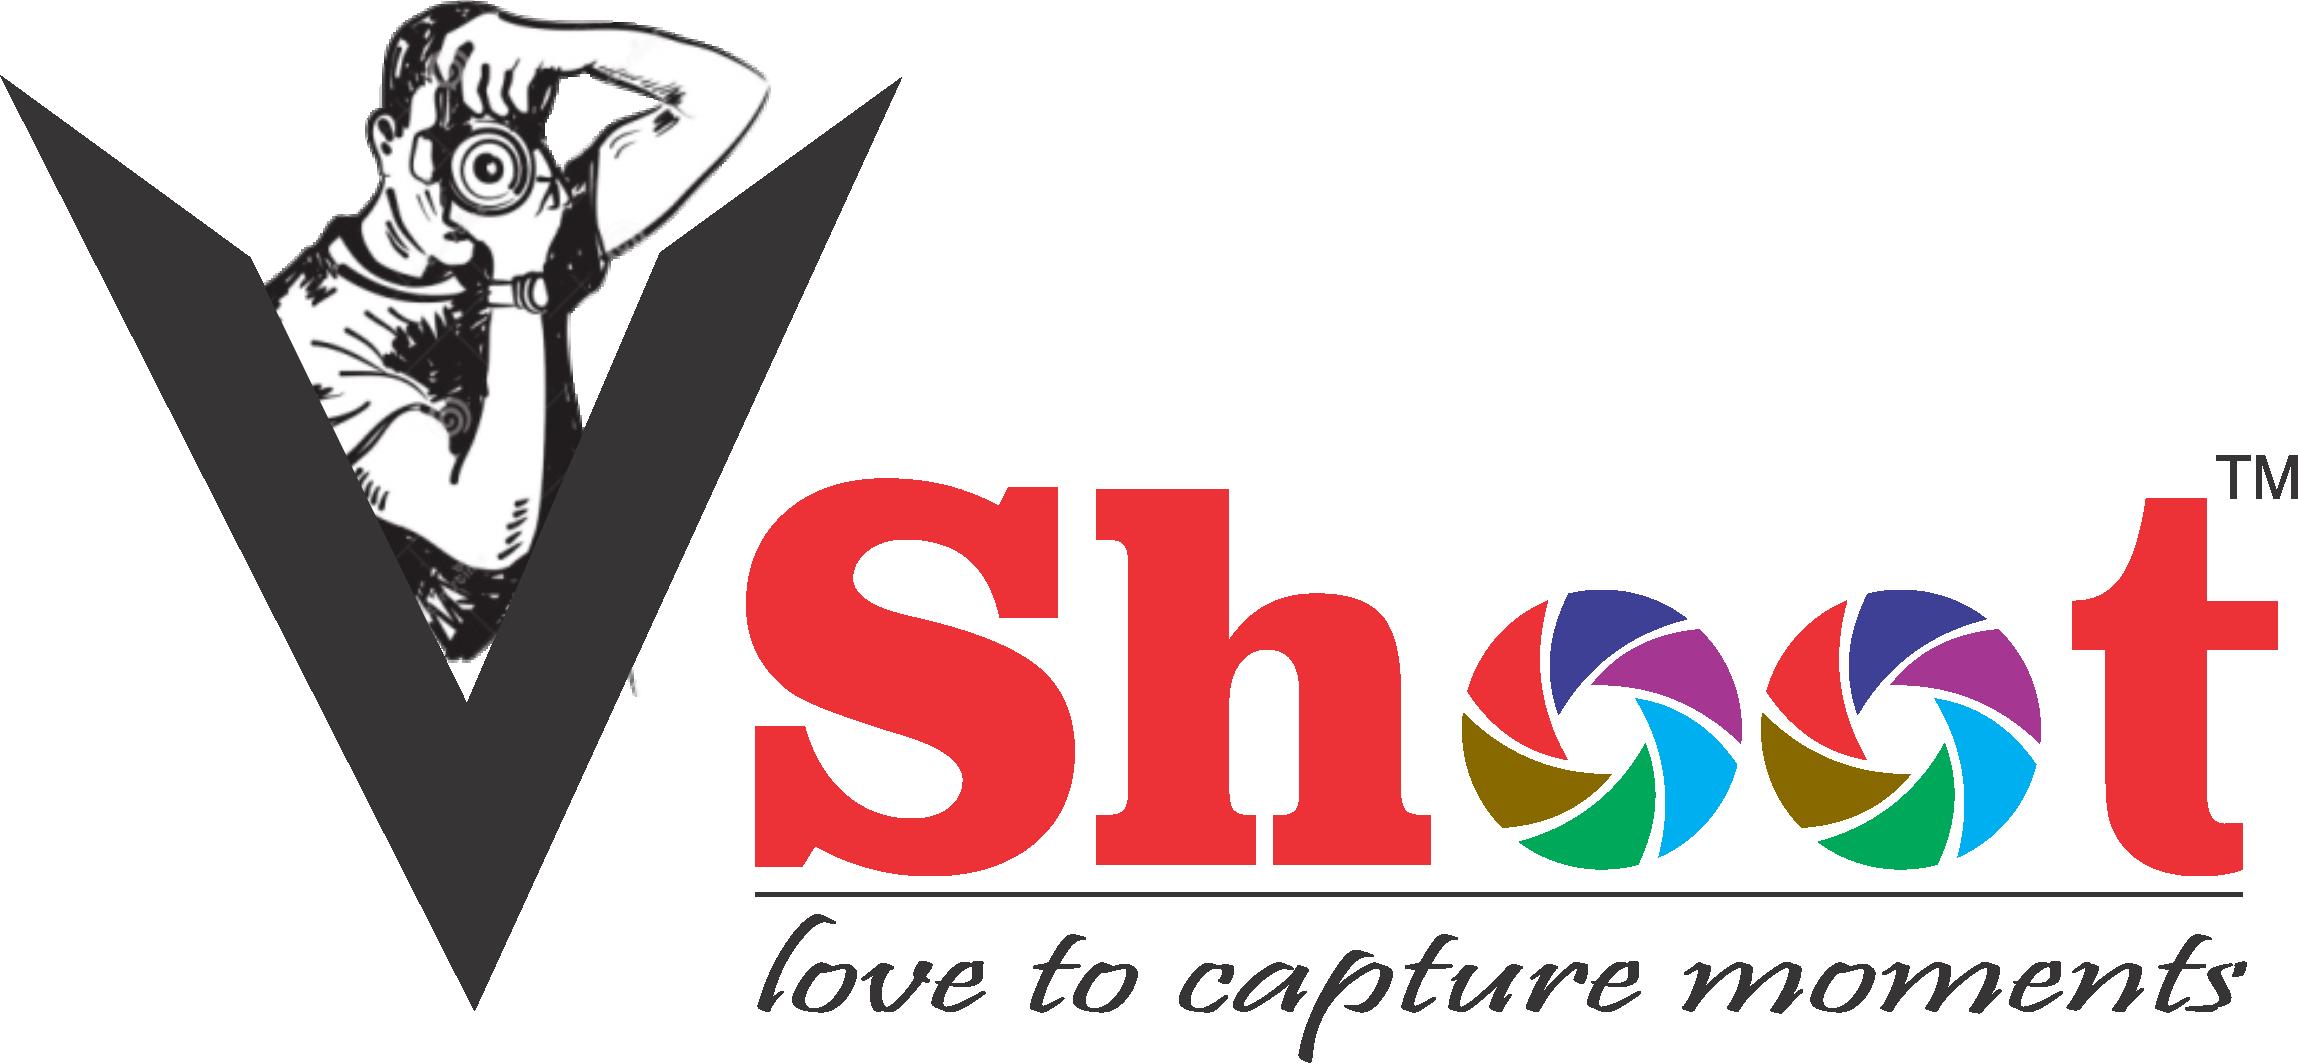 Photography clipart photography logo. Vshoot wedding event vshootwedding